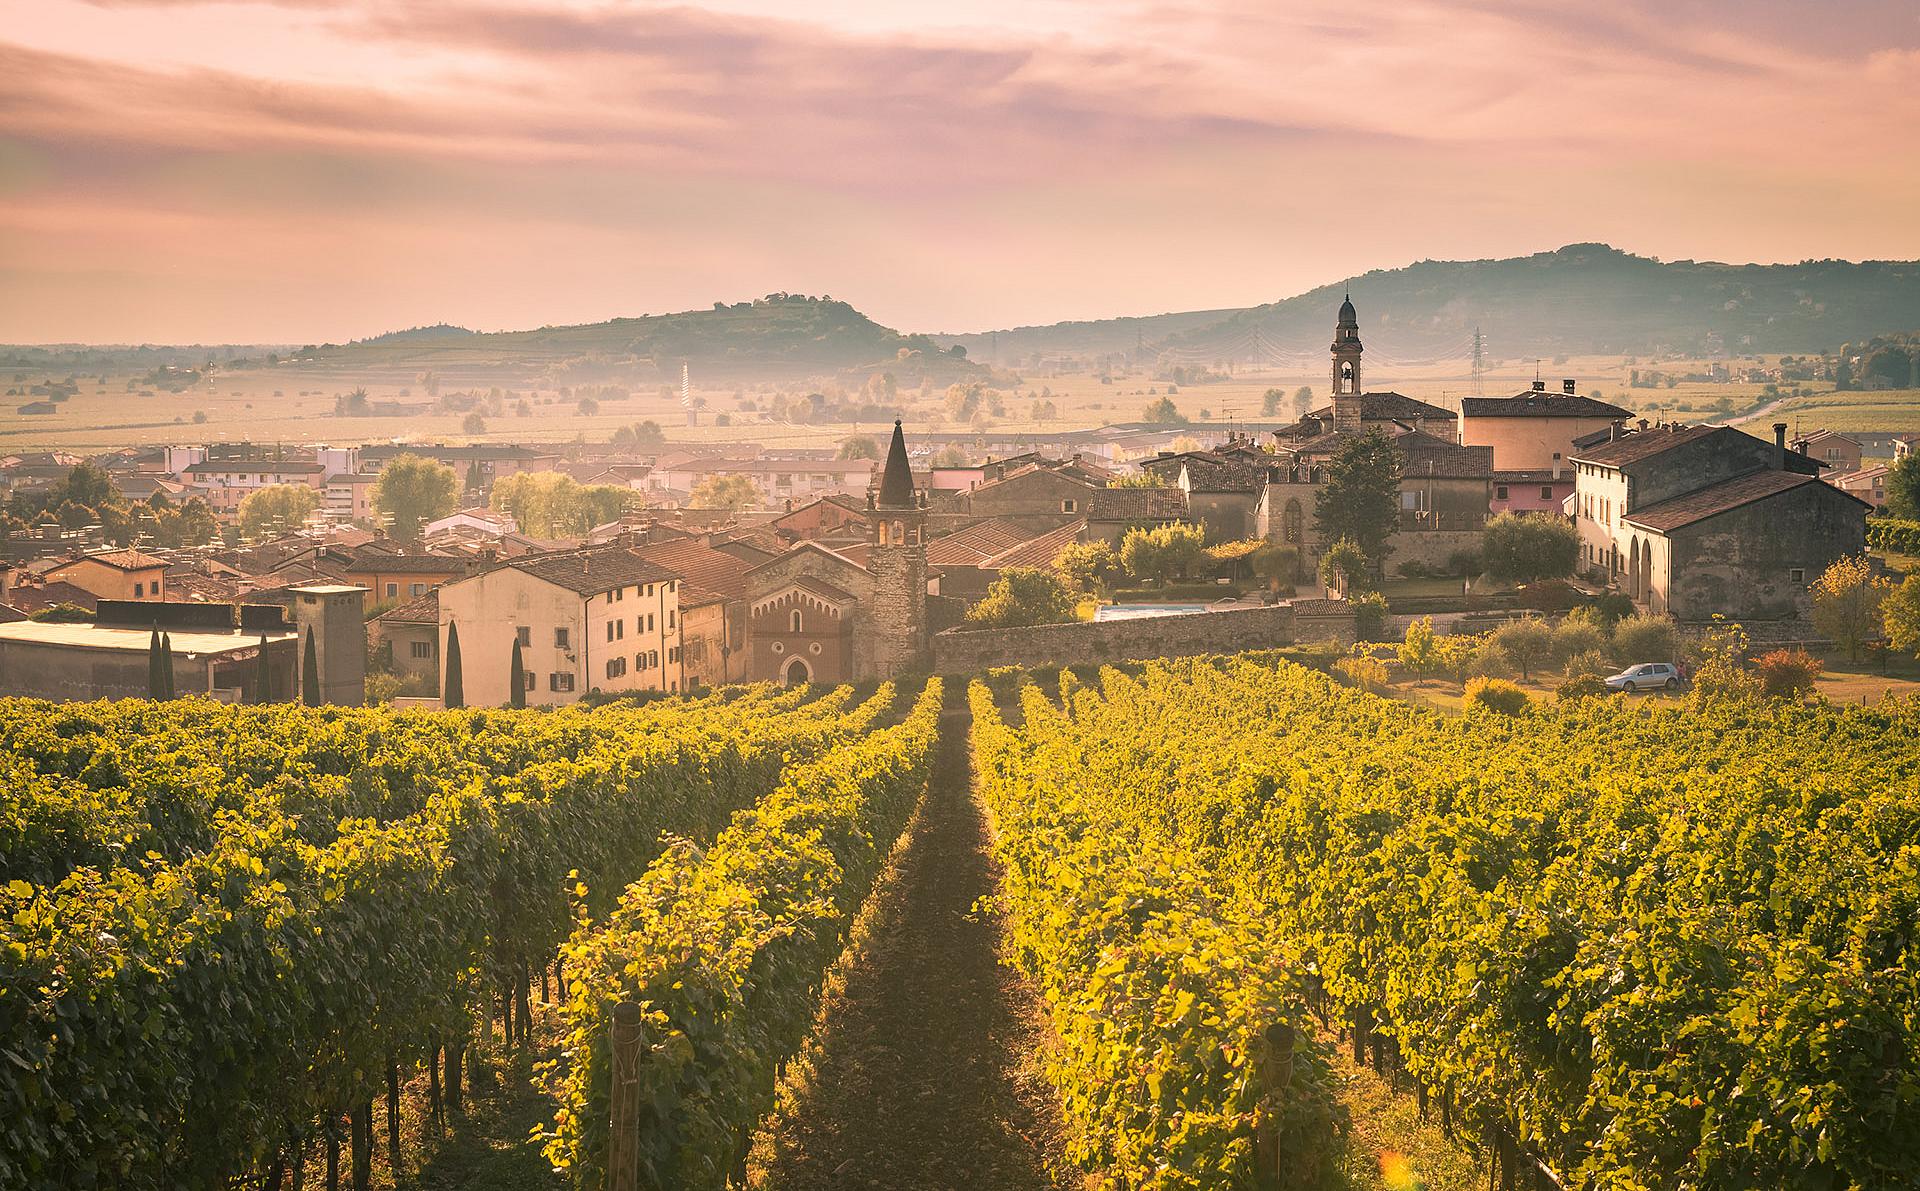 Tricolore Carganega Chardonnay Cantina di Monteforte